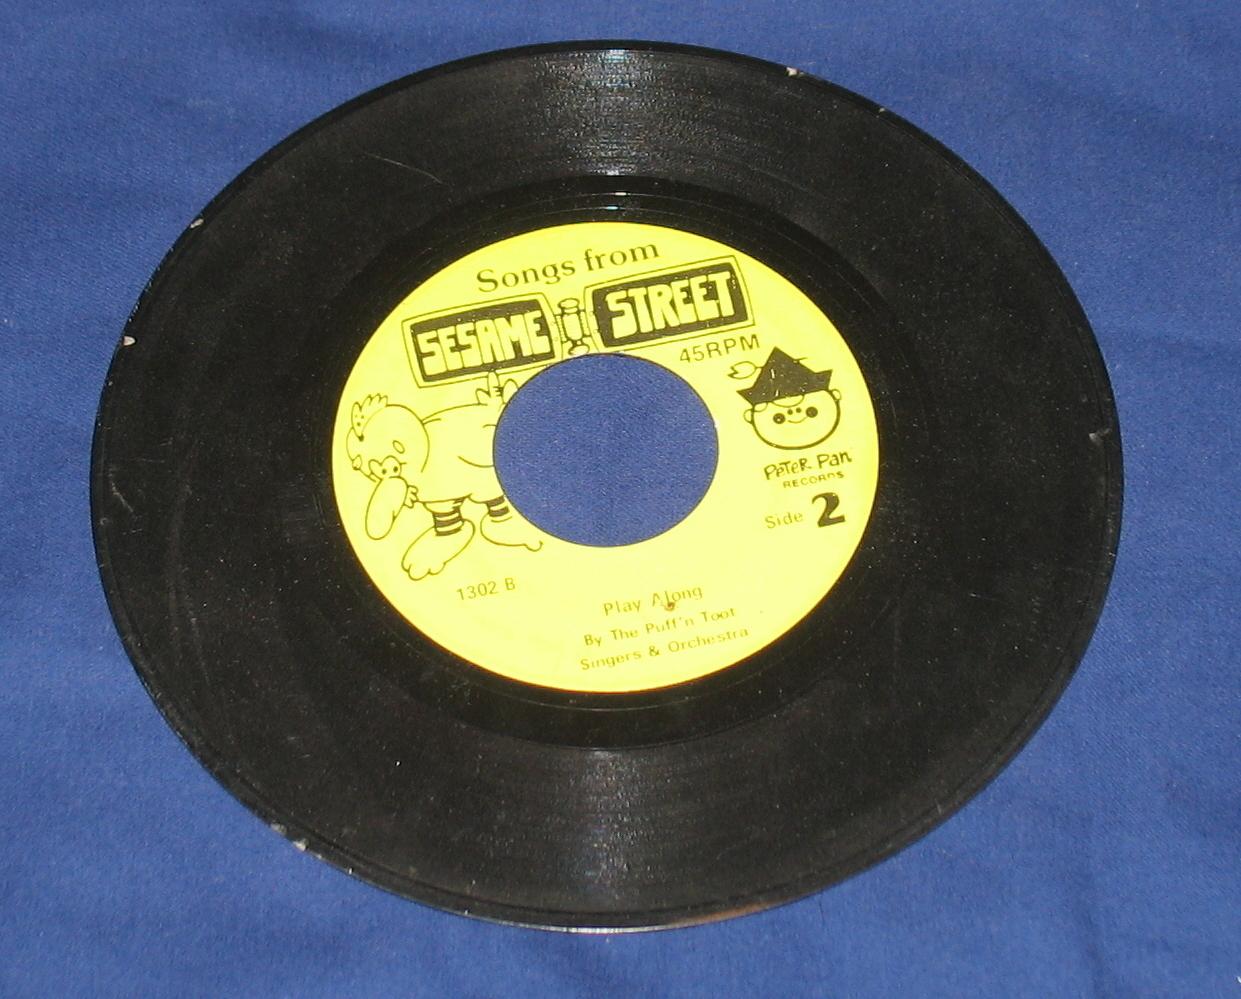 Sesame Street Sing & Play Along 45 rpm